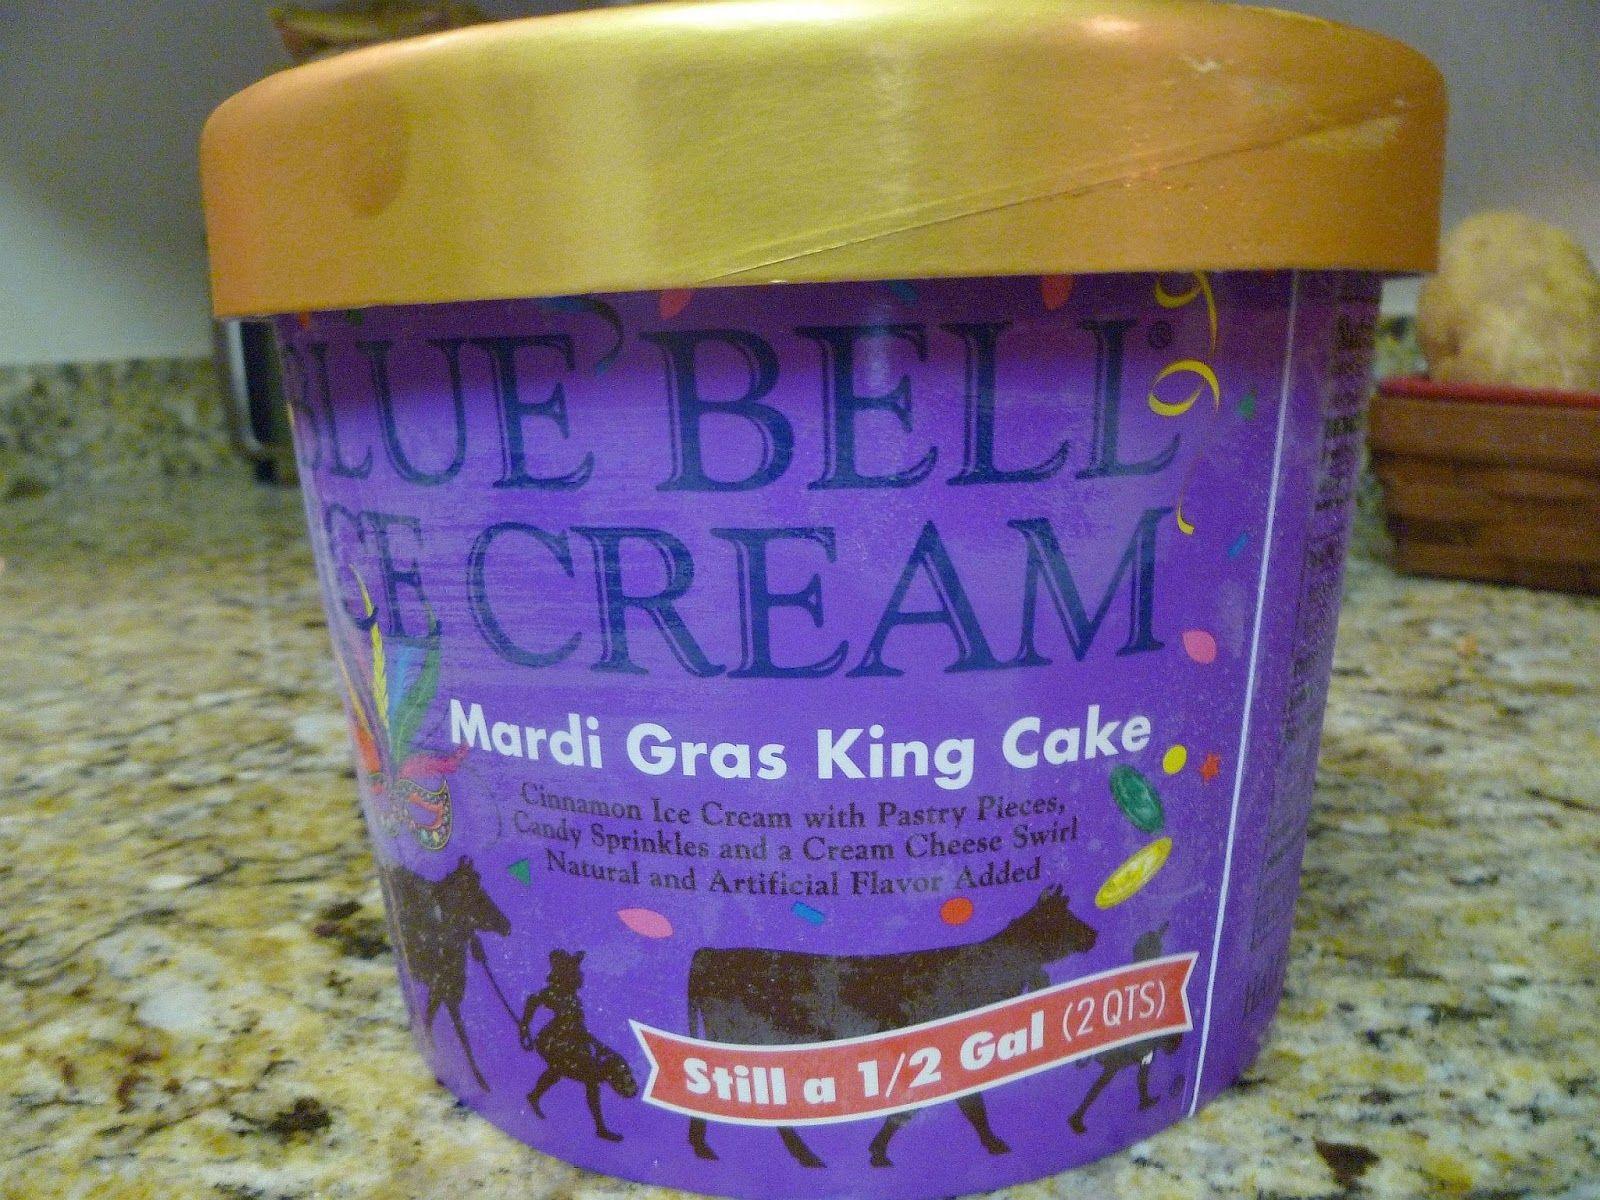 Blue bell ice cream mardi gras king cake mardi gras king